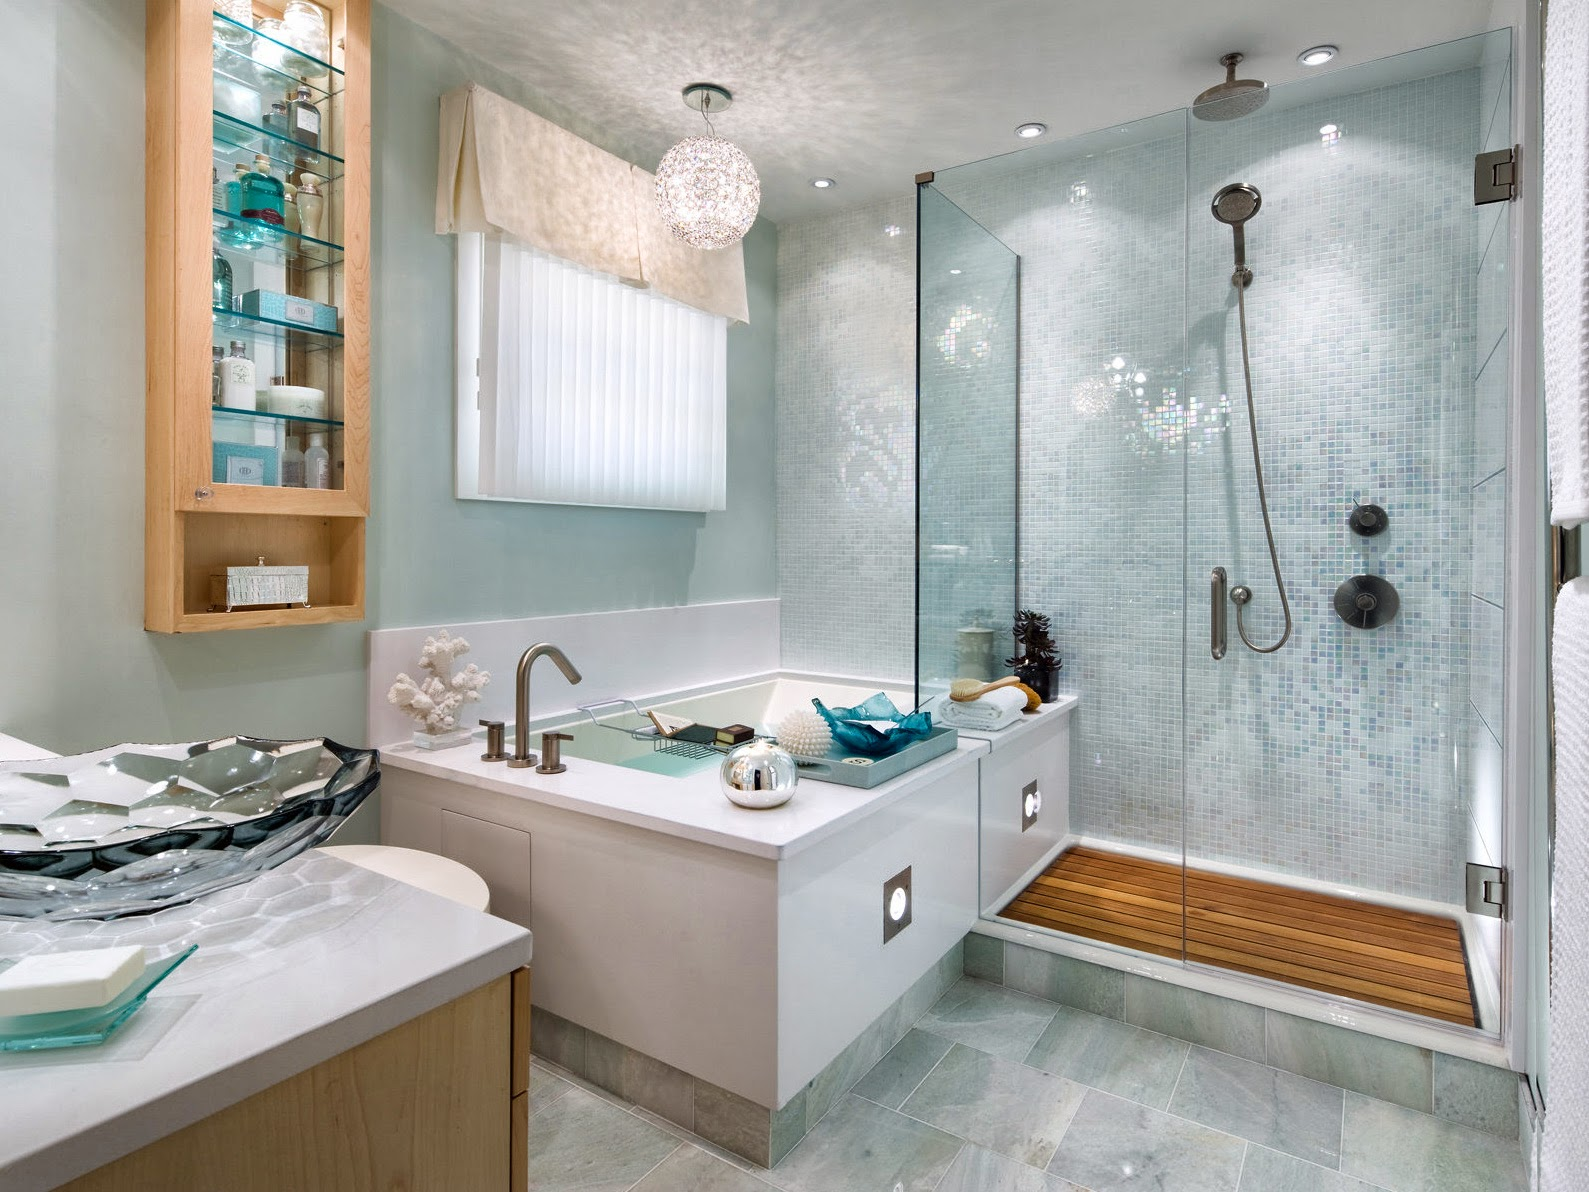 Best Bathroom Spy Camera